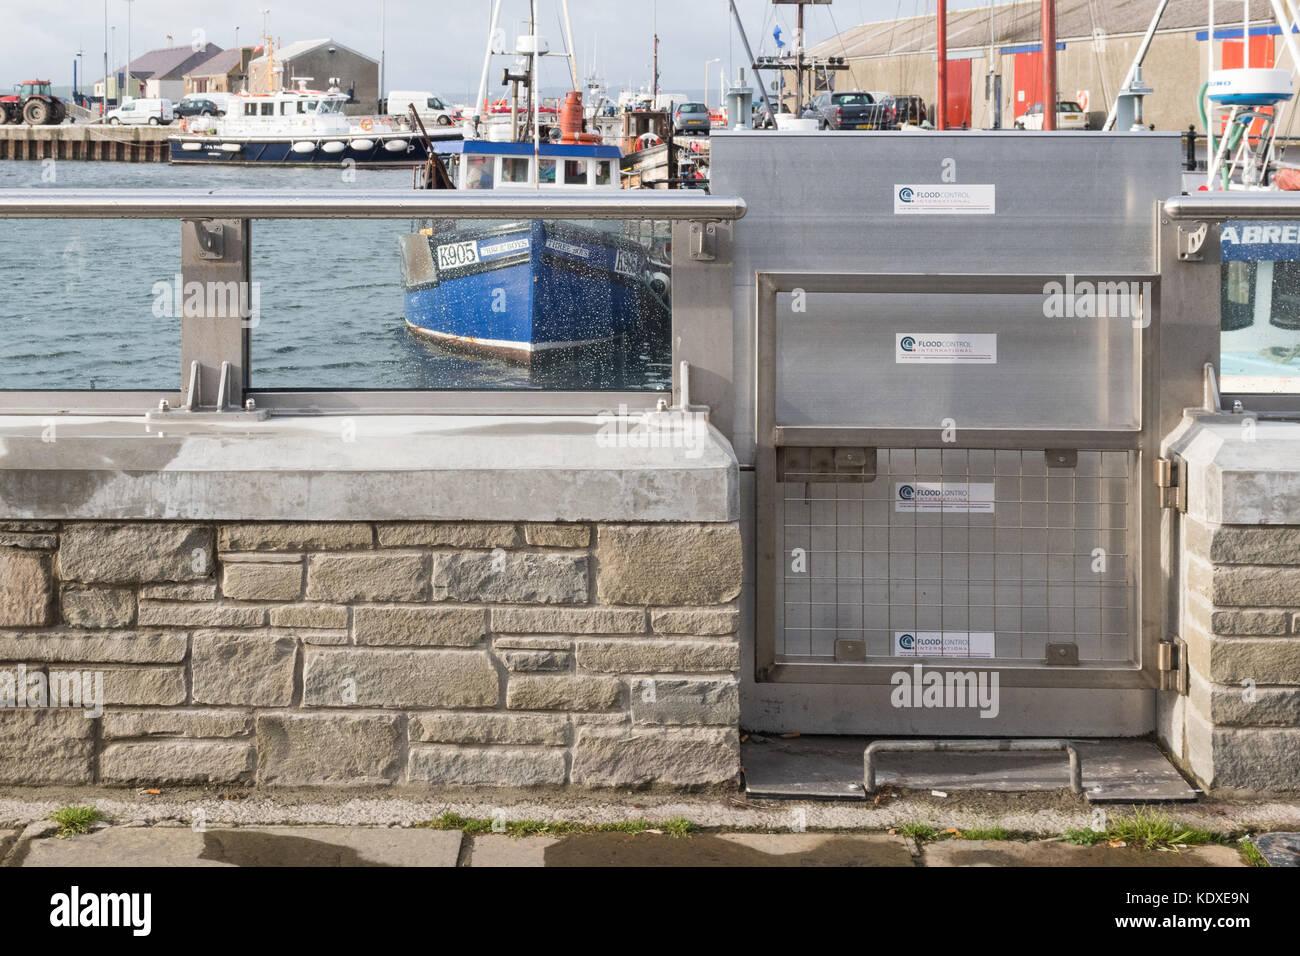 glass floodwall and flood gate - Kirkwall Harbour Flood Defence Scheme, Kirkwall, Orkney, Scotland, UK - Stock Image